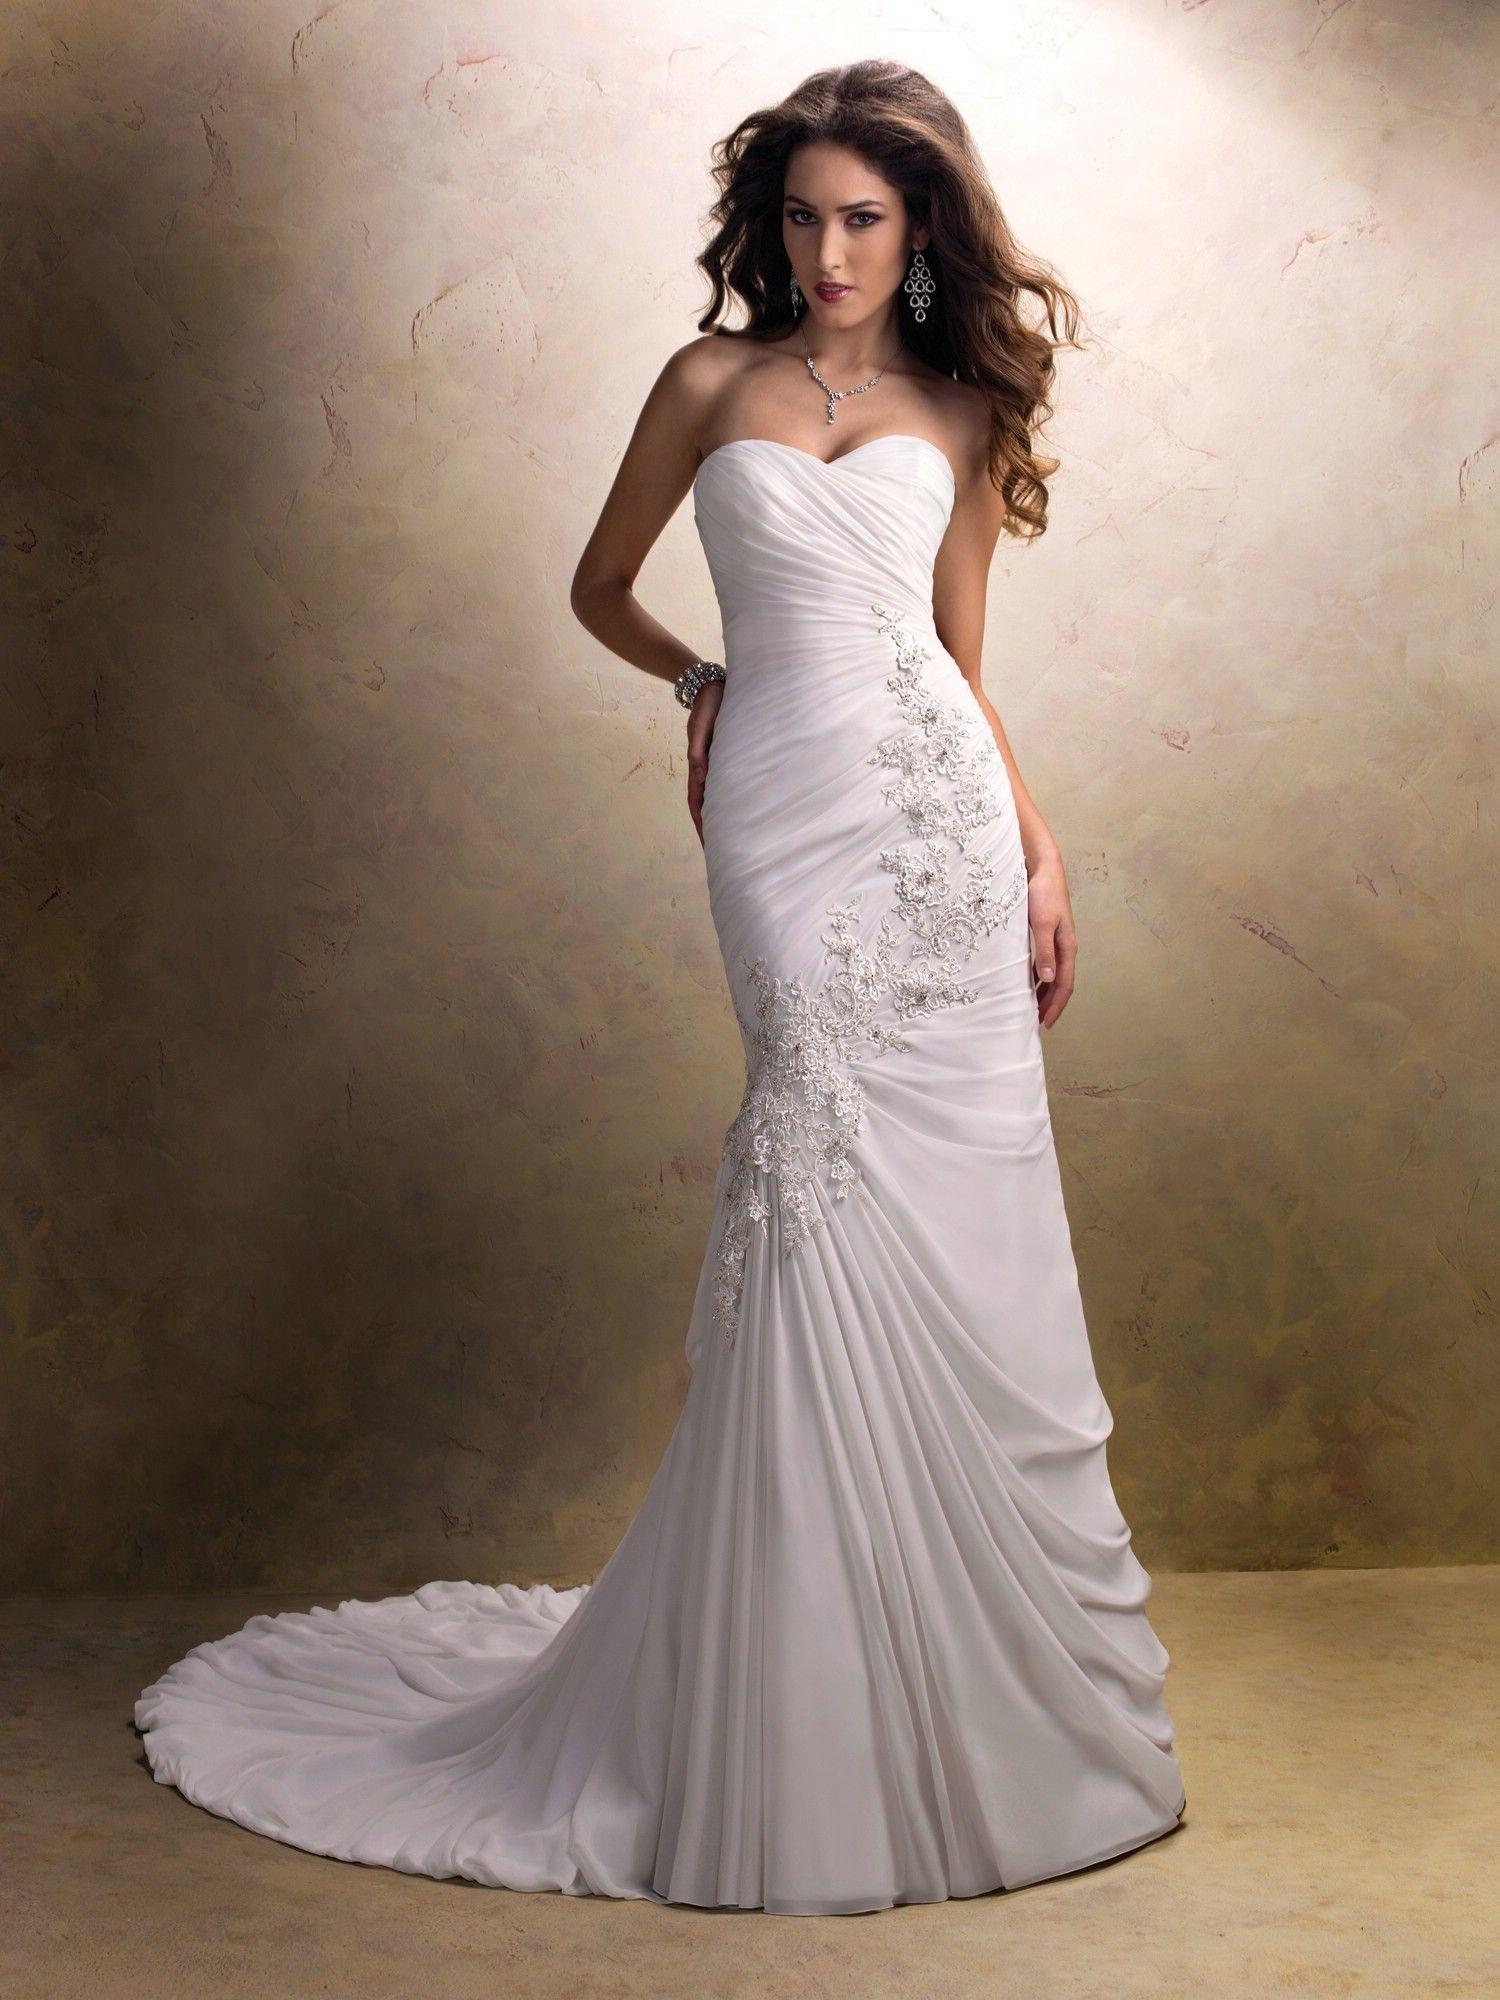 Maggie Sottero Wedding Dresses - Style Hillary 12523 2013 Maggie Sottero dress Hillary 12523 - BestBridalPrices [Hillary] - $1,049.00 : Wedd...